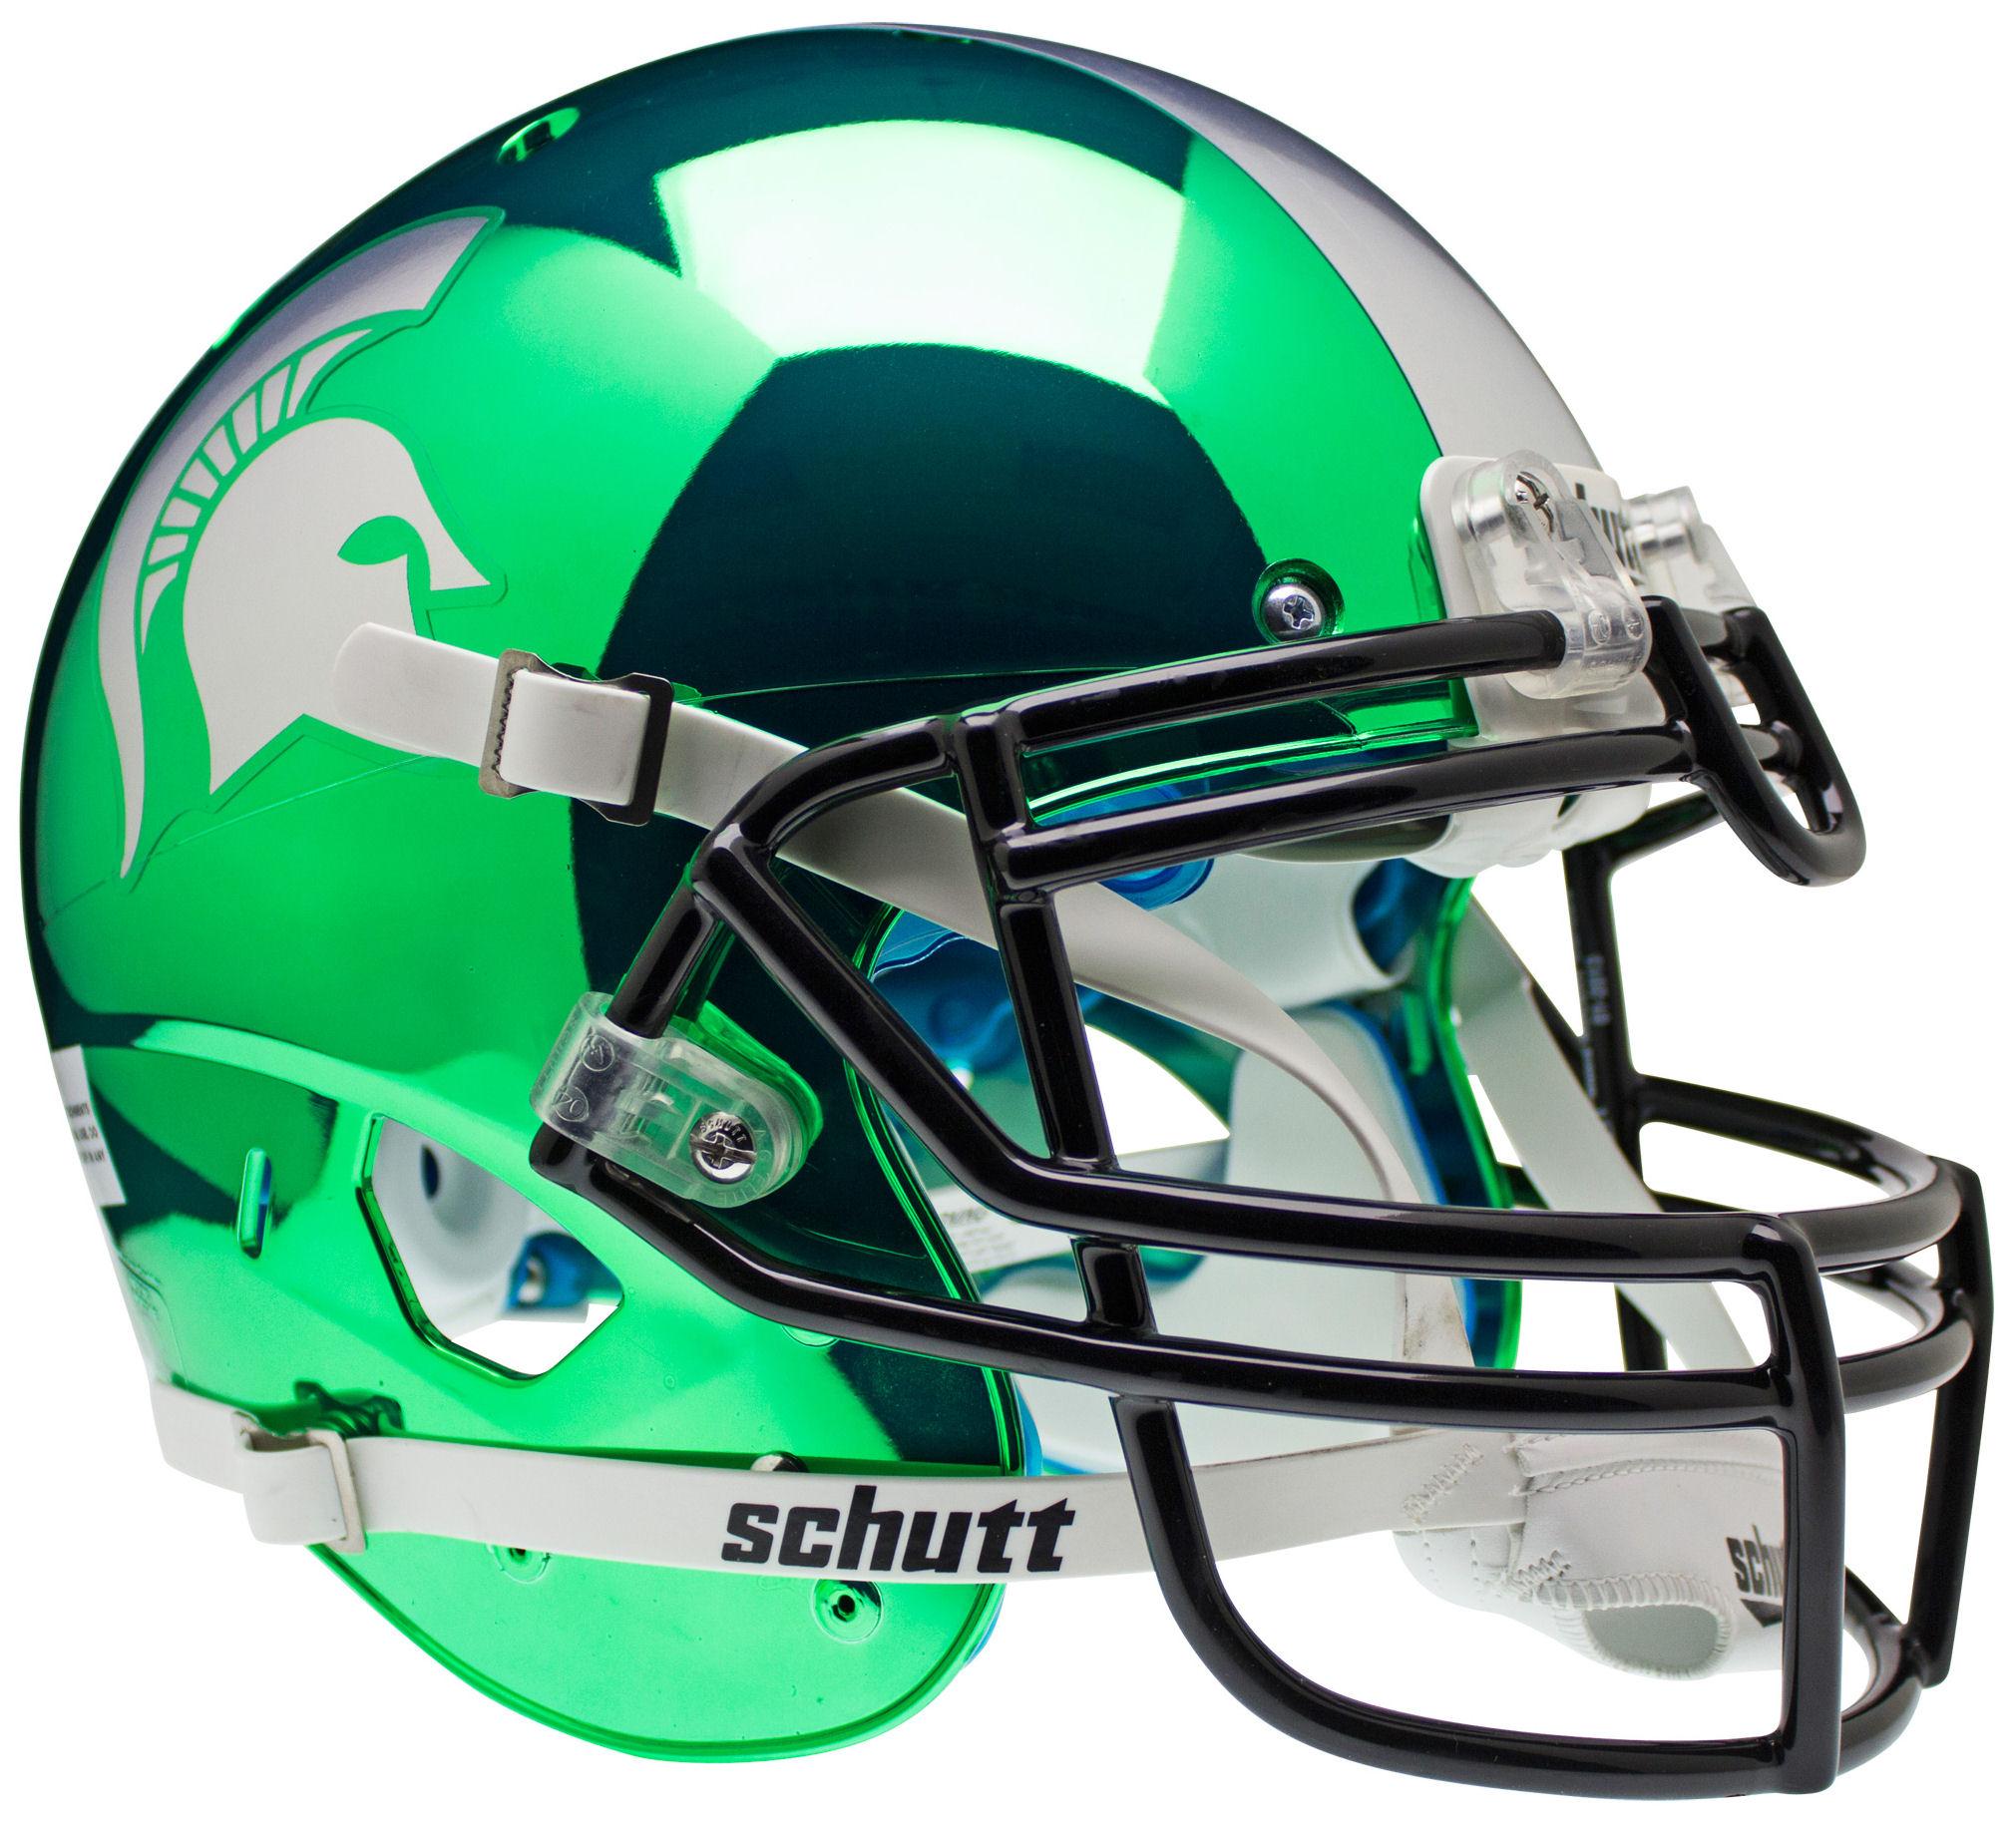 Michigan State Spartans Authentic College XP Football Helmet Schutt <B>Chrome</B>